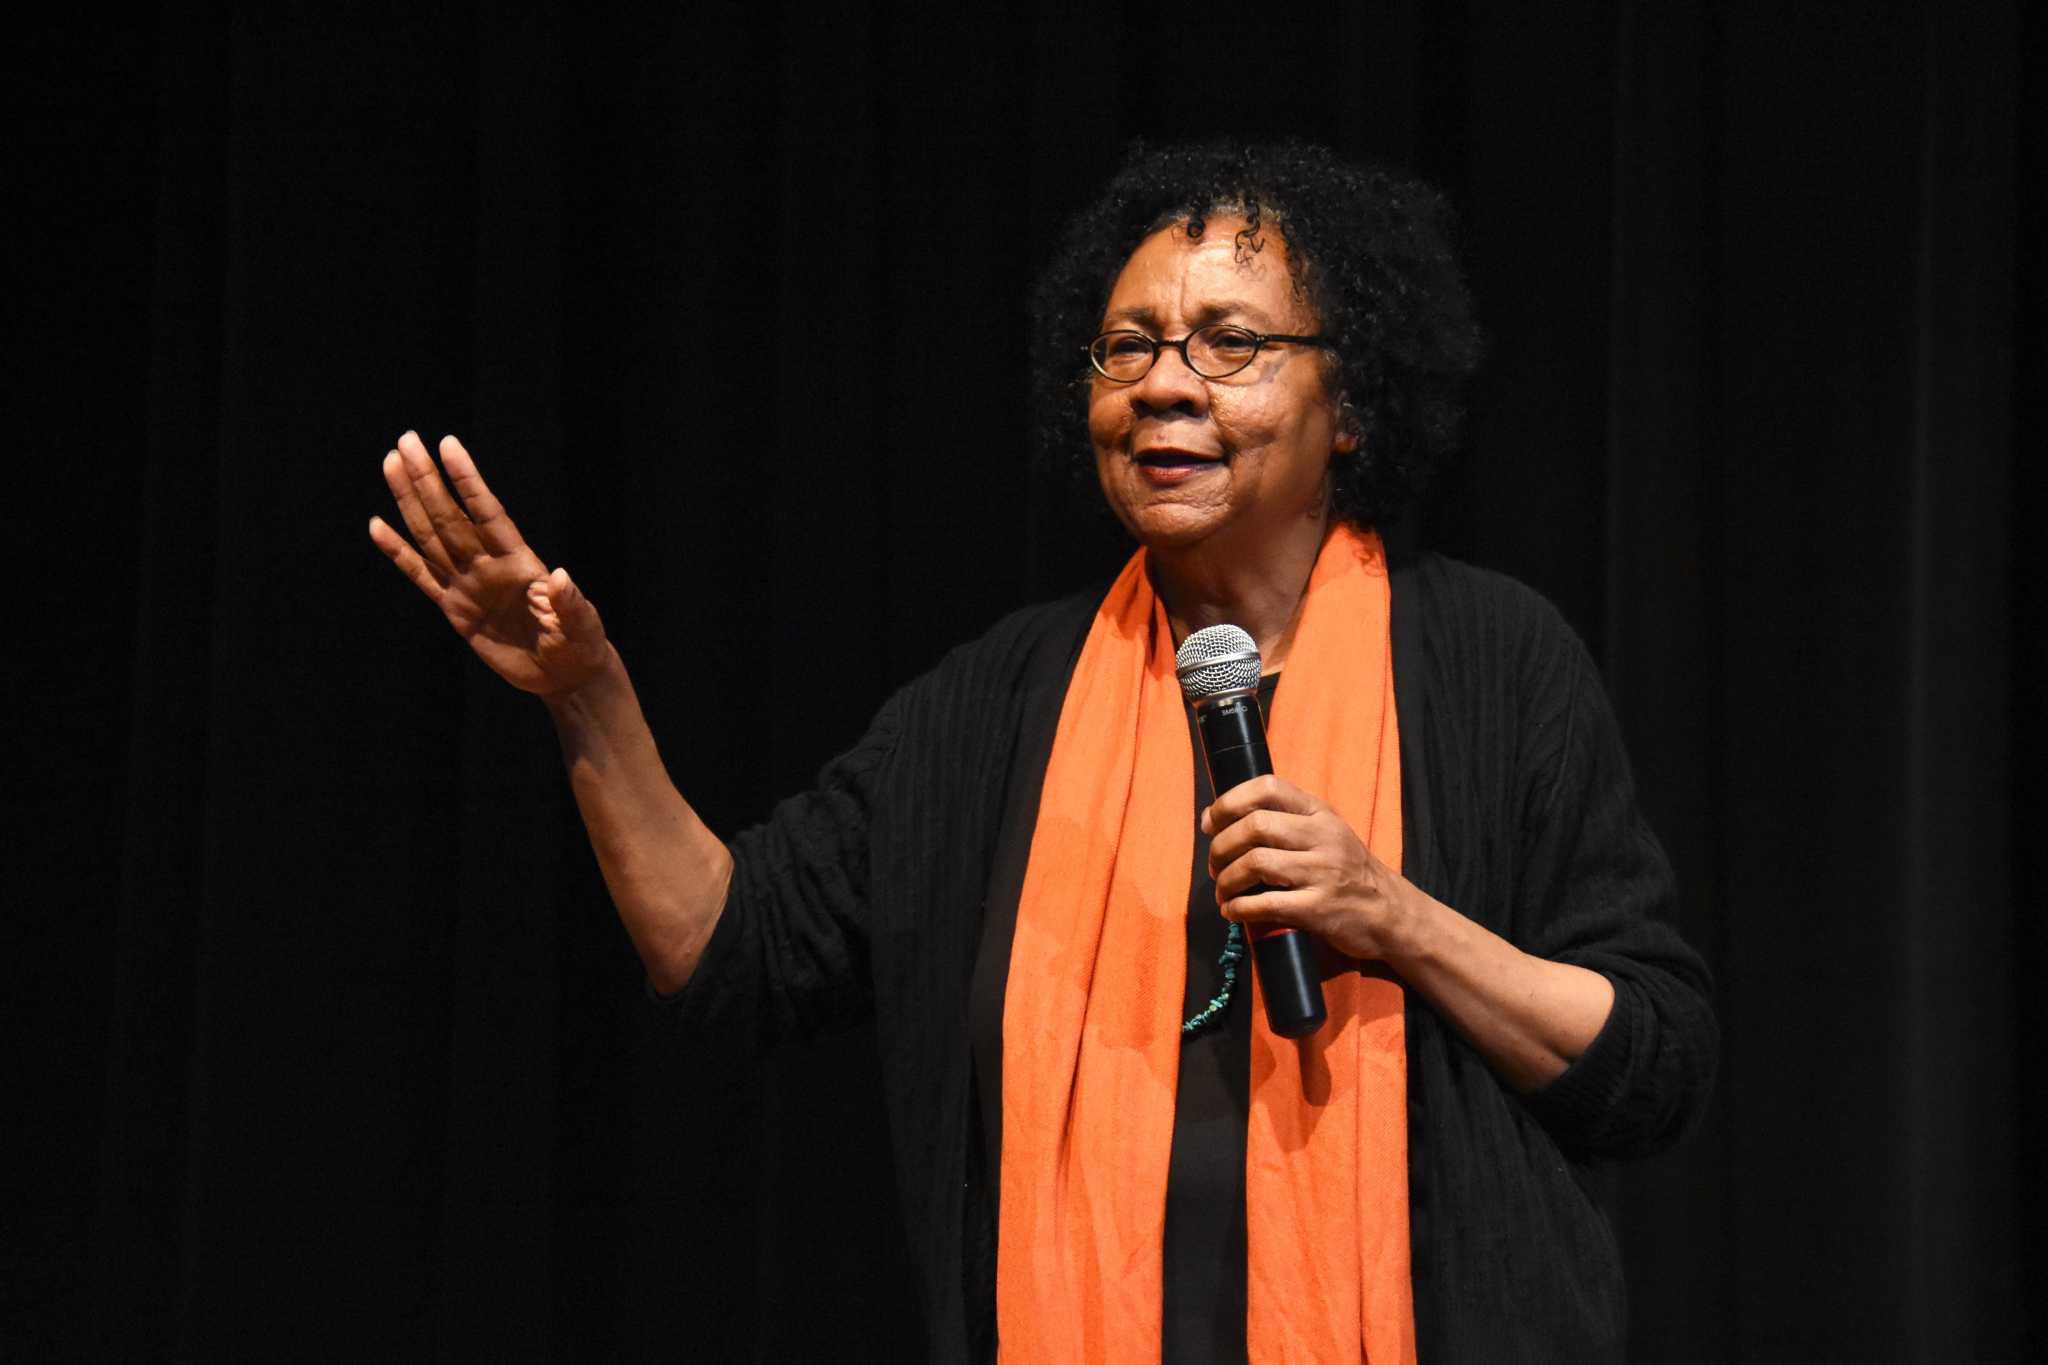 Bell Hooks, Author, Professor, Feminist, and Social Activist